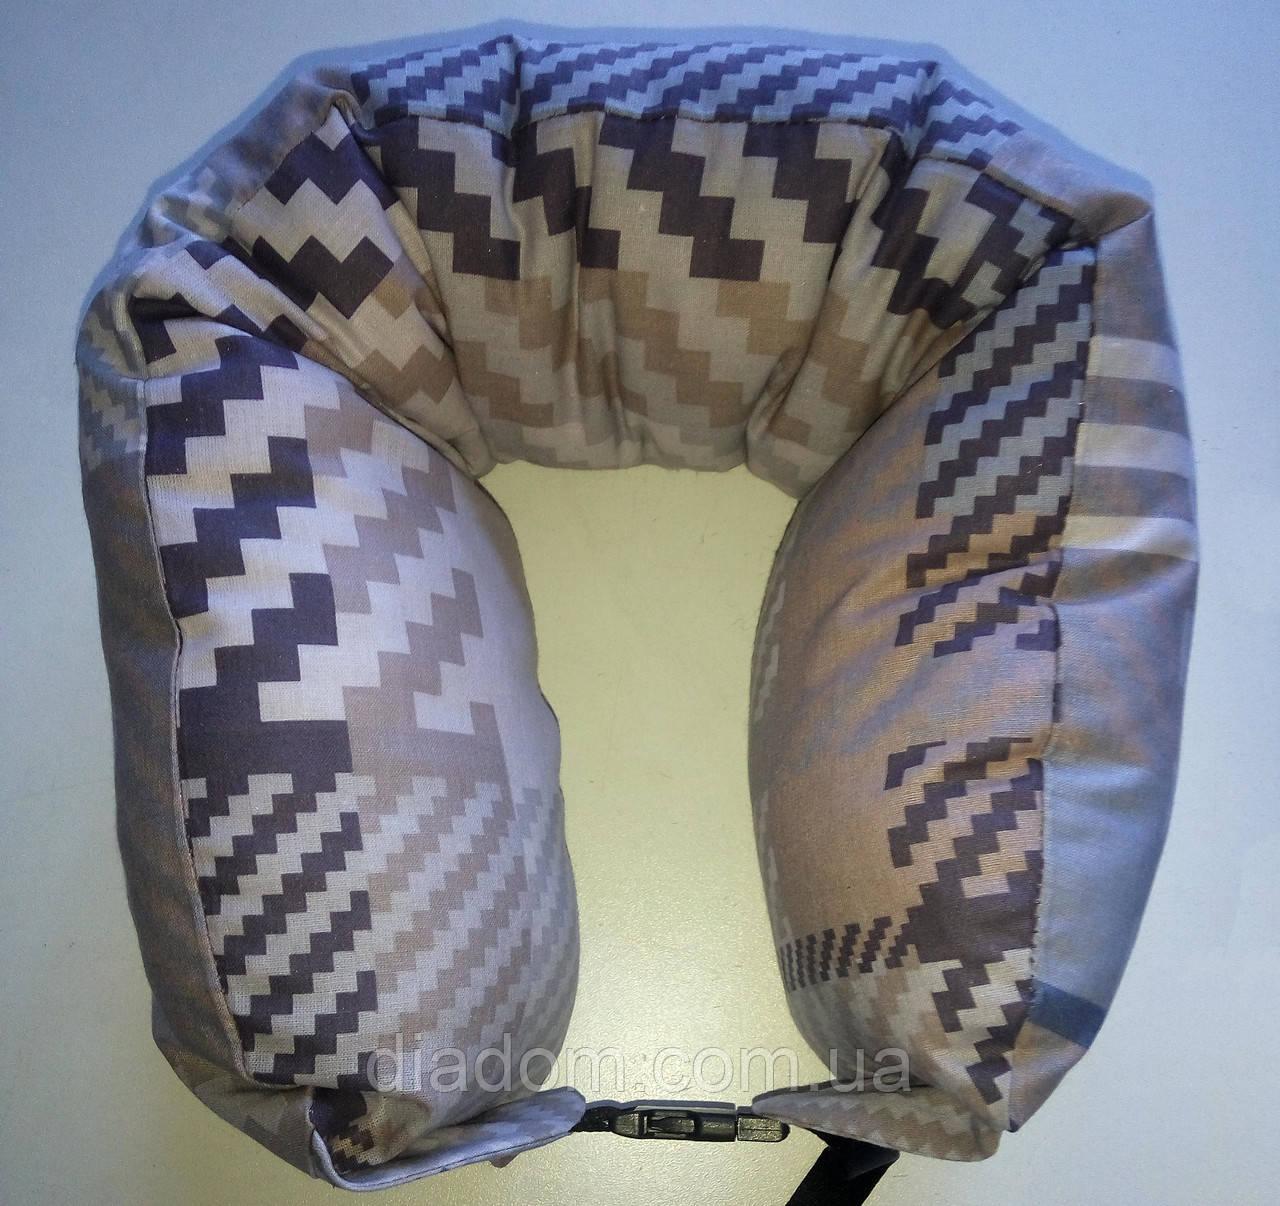 Дорожня подушка-трансформер Reverie (Ревери), Кольори в асортименті